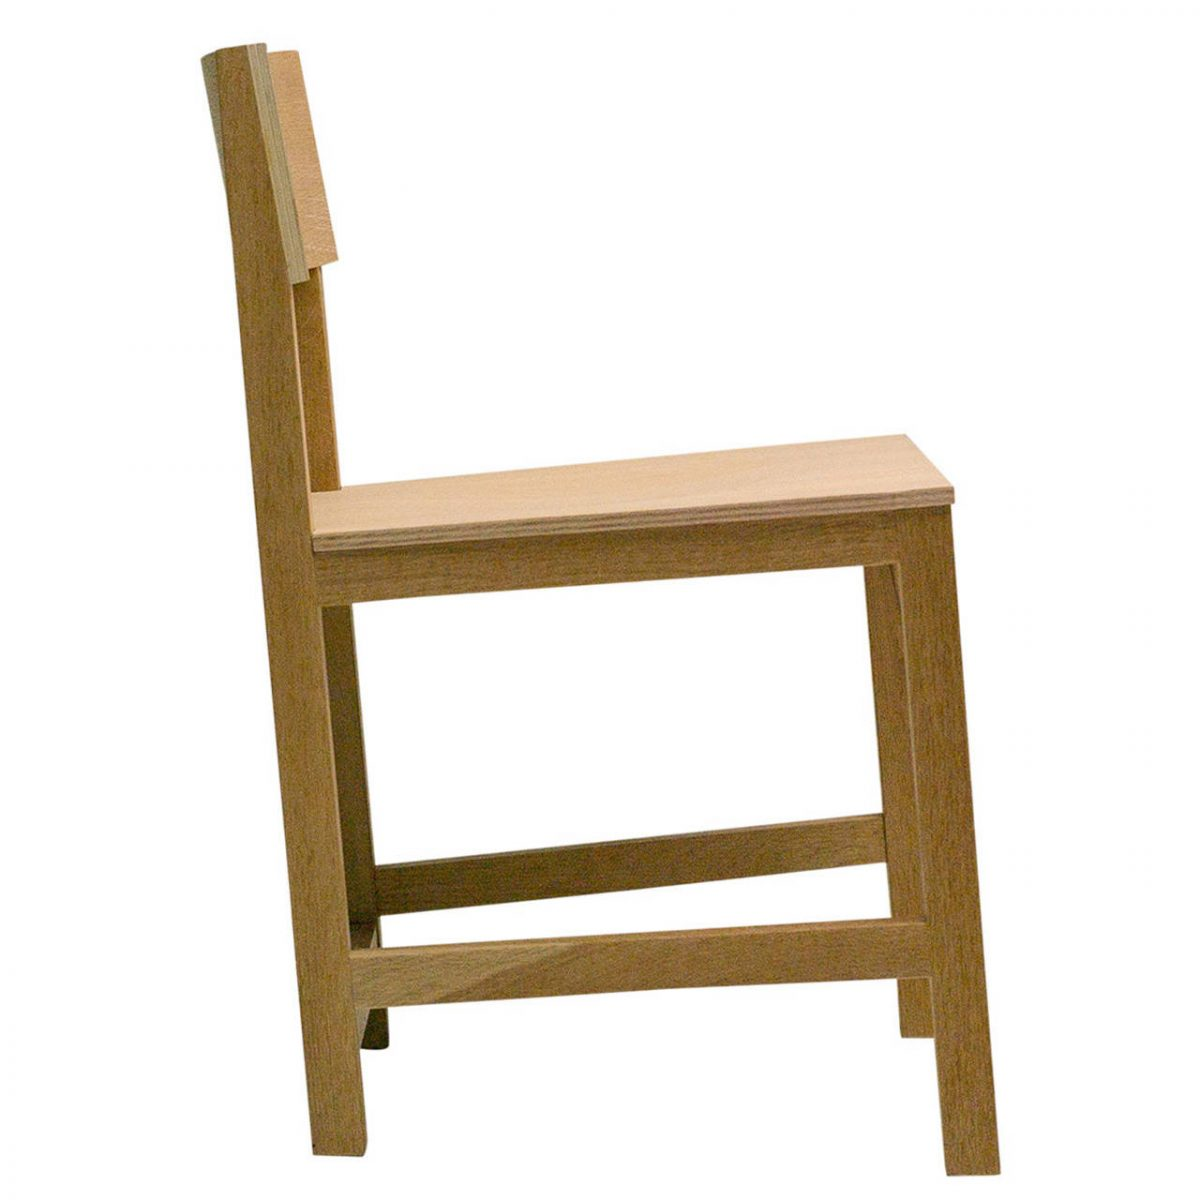 AVL Shaker stoel